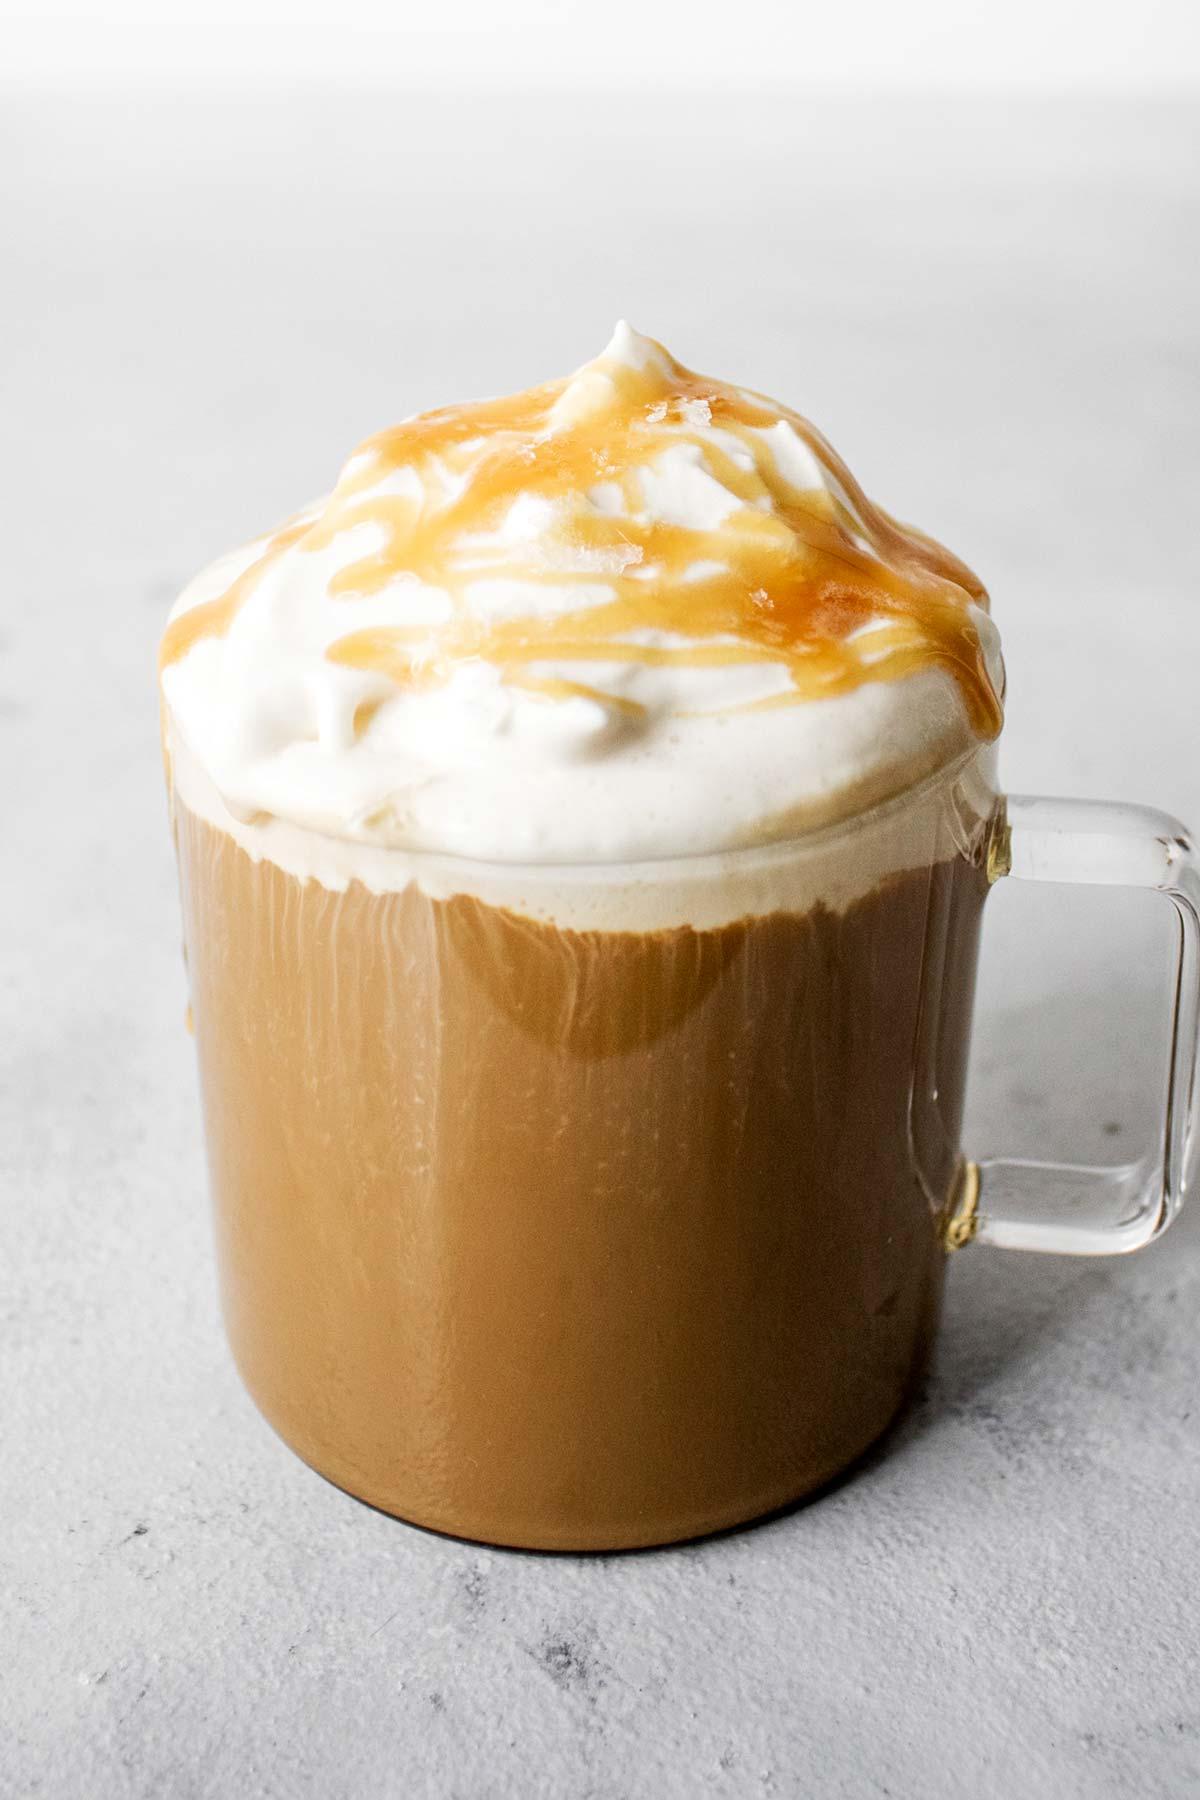 Salted caramel latte in a glass mug.